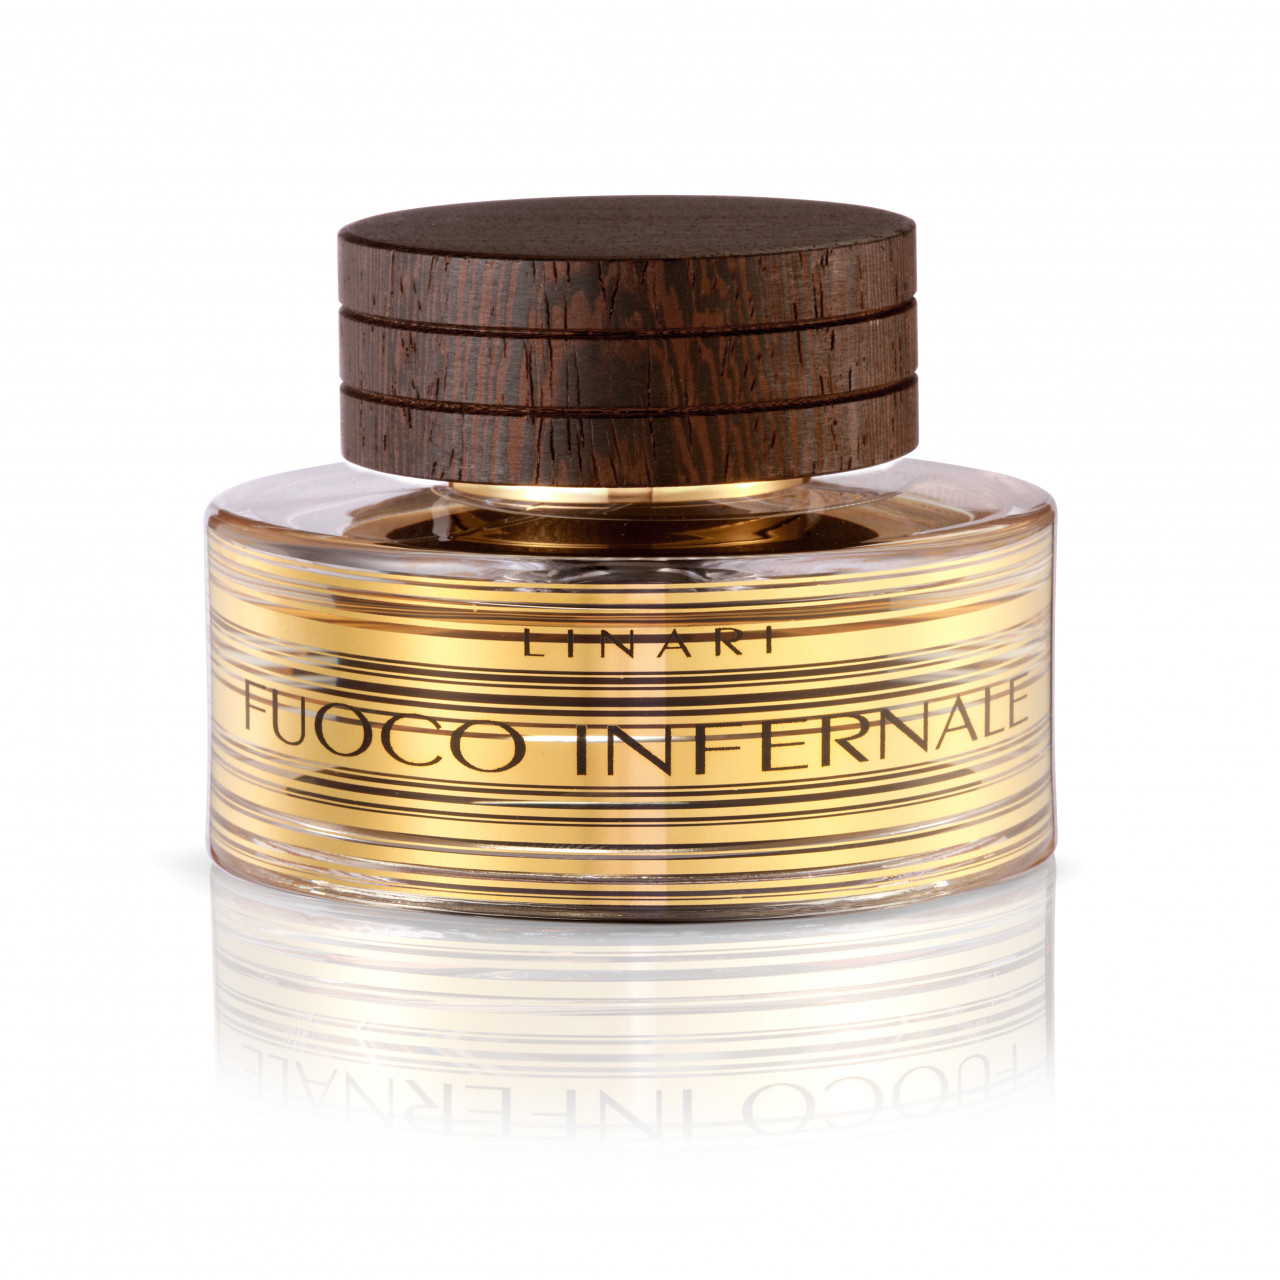 Linari Finest Fragrances - FUCO INFERNALE Eau de Parfum Spray | Düfte